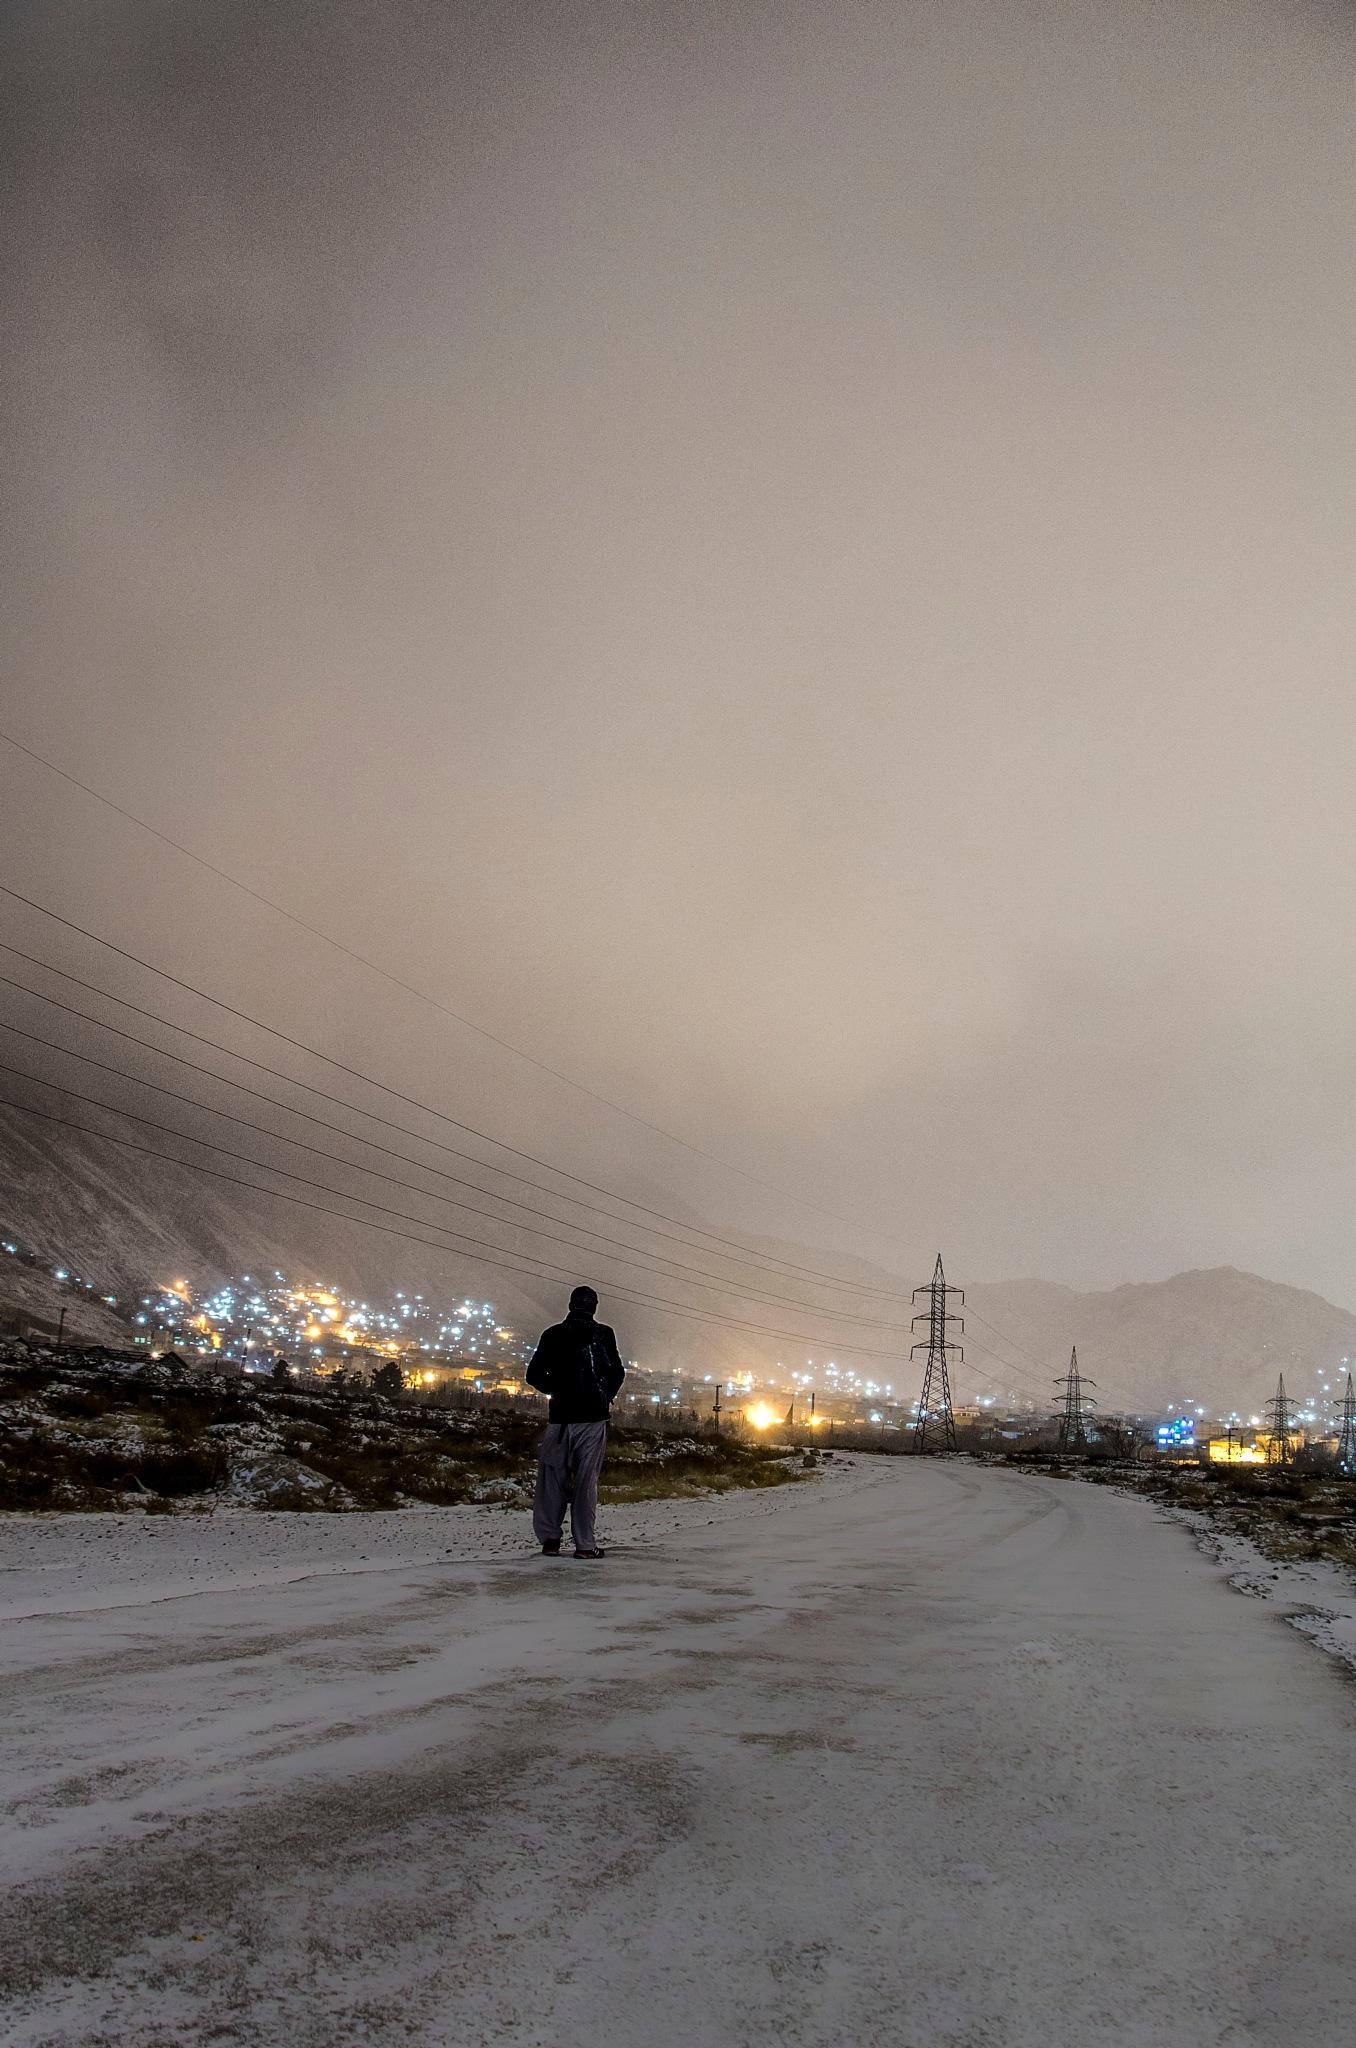 A midnight walk by Hasan Raza Khan